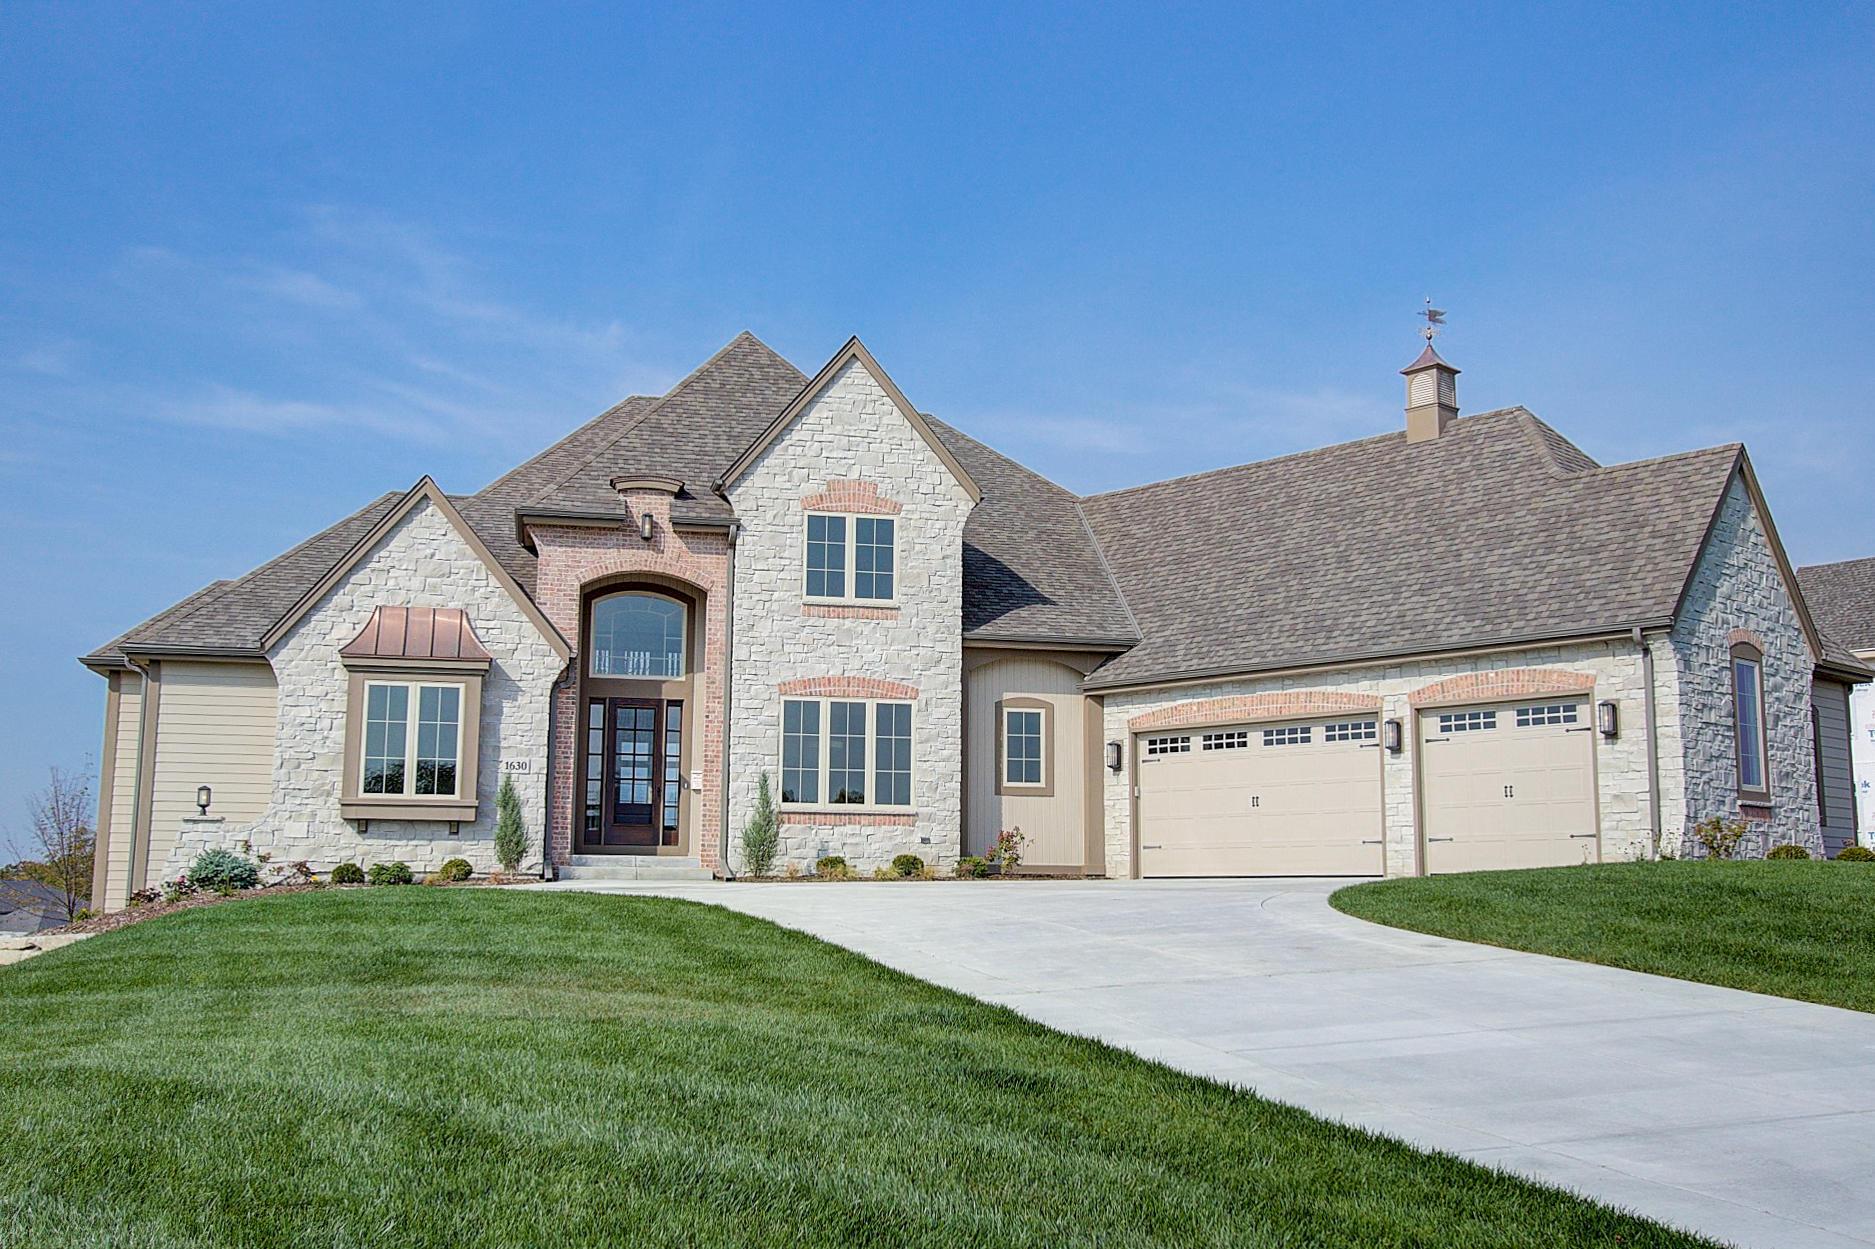 1630 Twisted Oak Ct, Hartland, Wisconsin 53029, 5 Bedrooms Bedrooms, 15 Rooms Rooms,4 BathroomsBathrooms,Single-Family,For Sale,Twisted Oak Ct,1536835